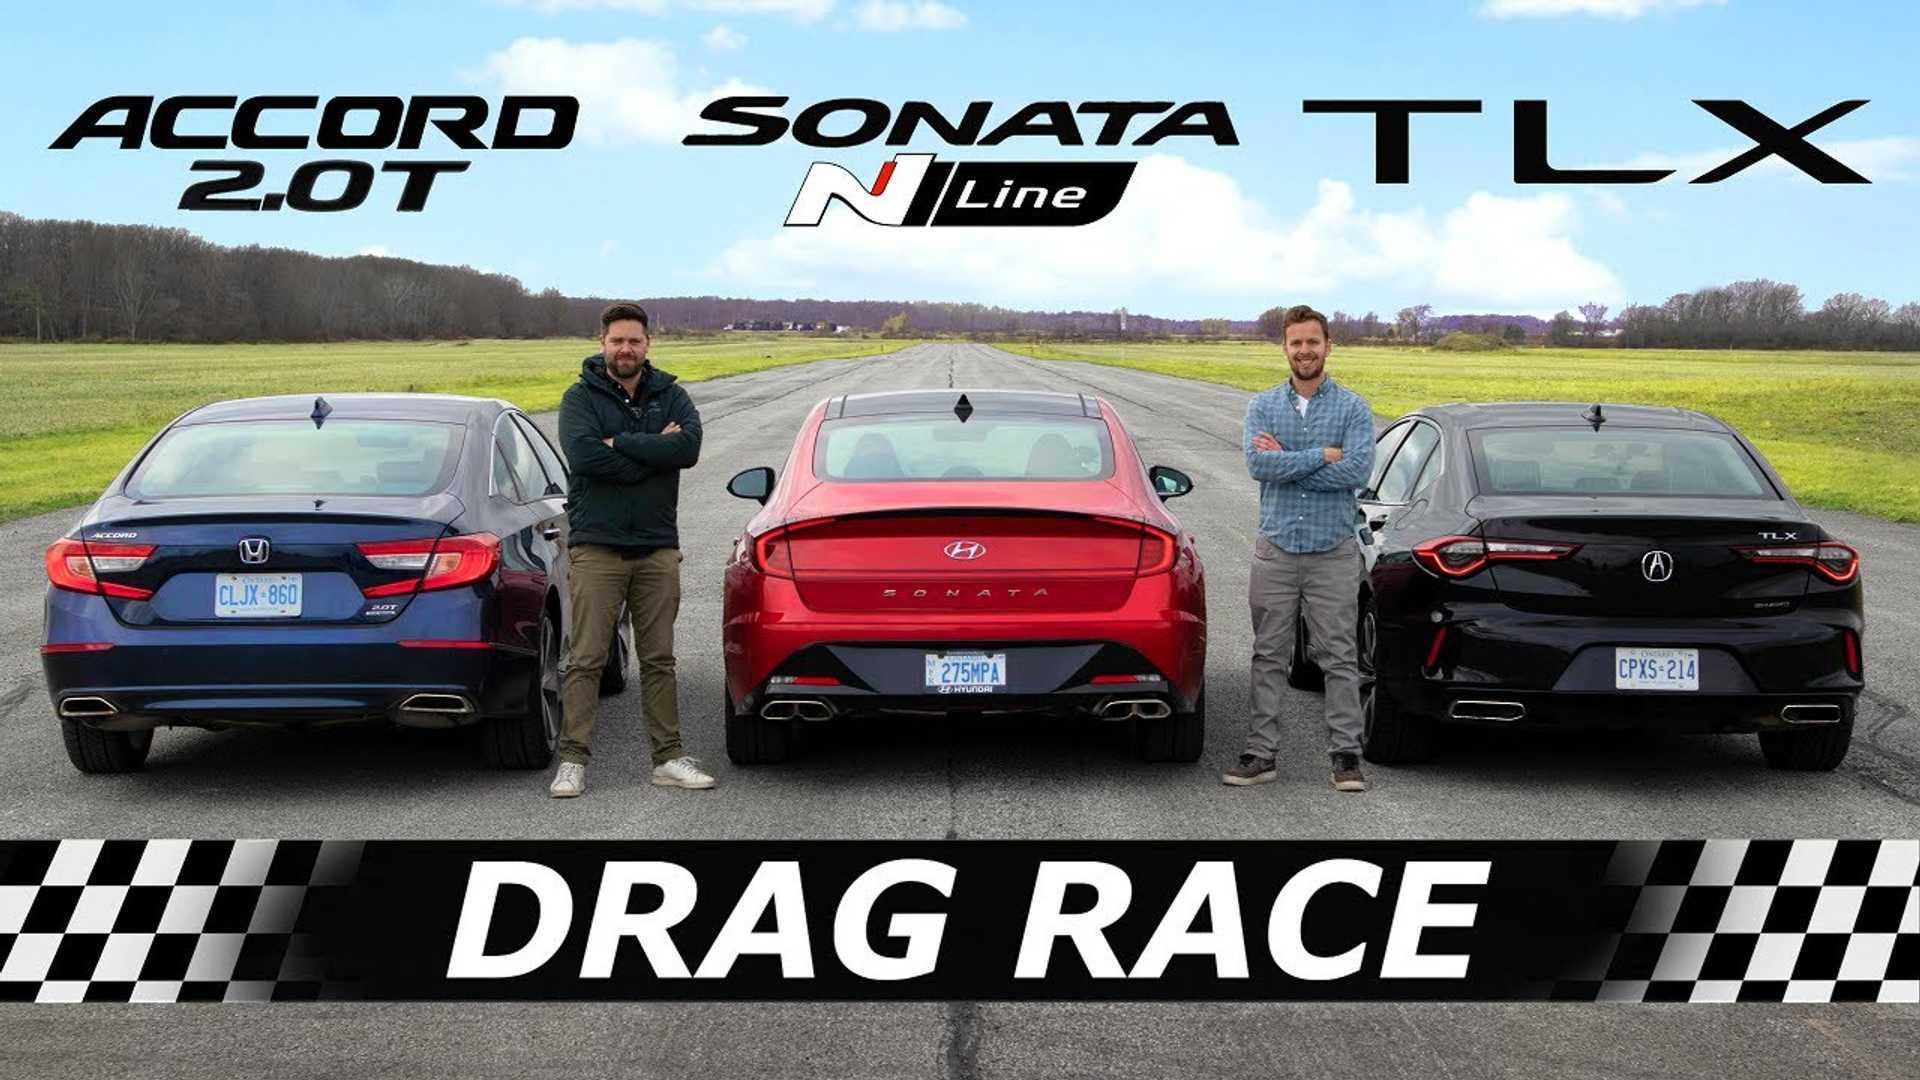 Новый Hyundai Sonata N Line встречает Honda Accord и Accura TLX в Drag Race